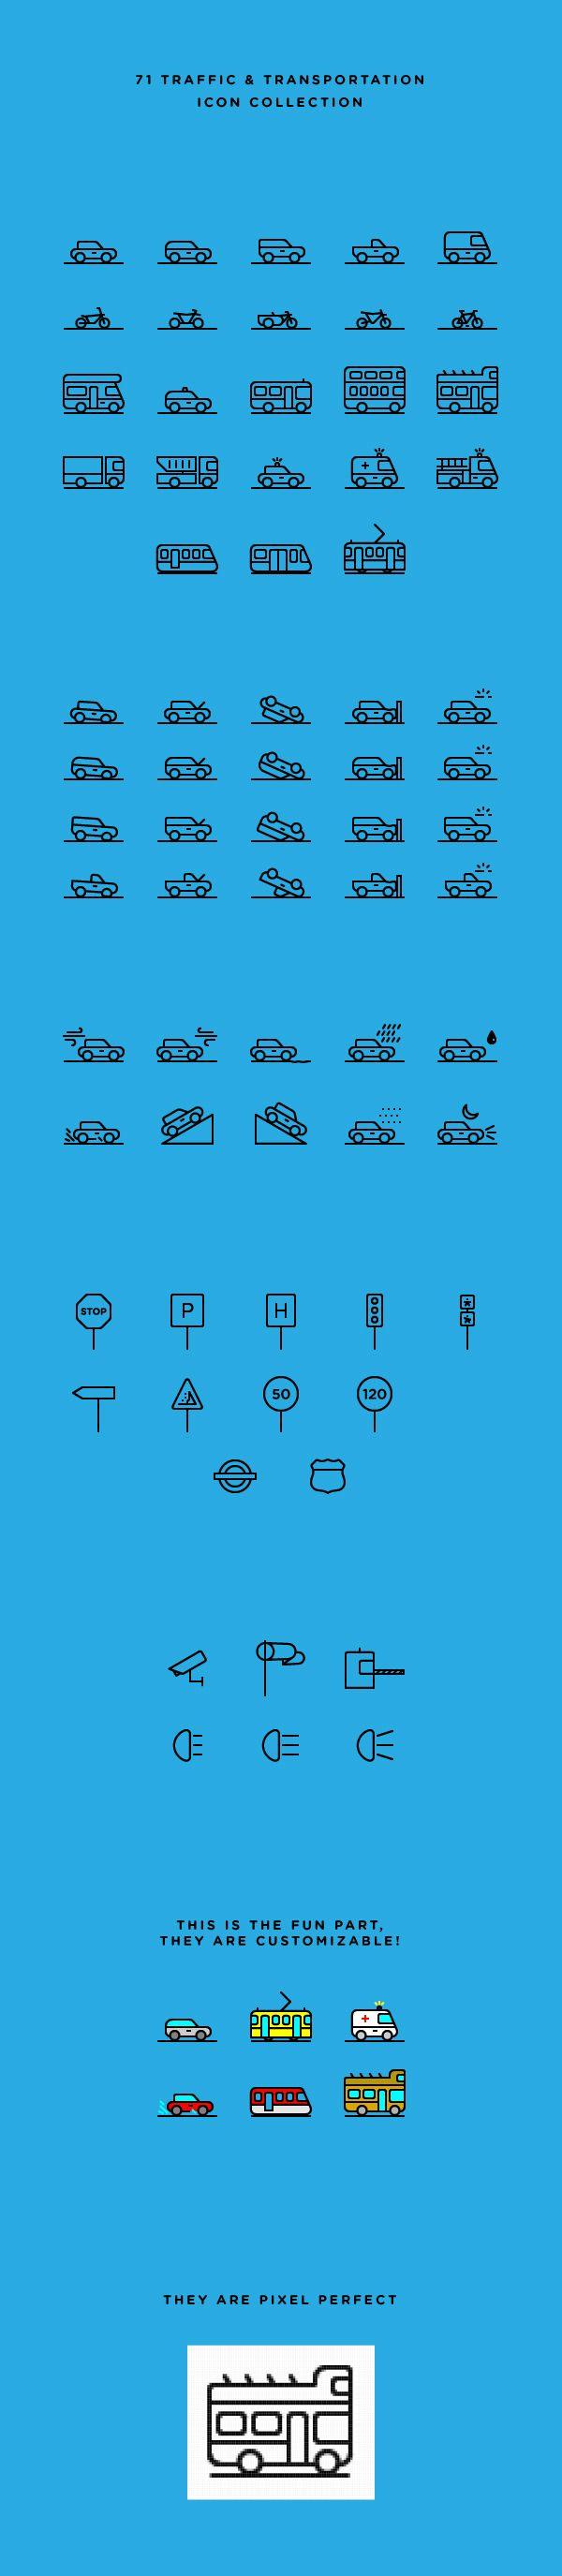 71 Traffic & Transportation Icons | GraphicBurger